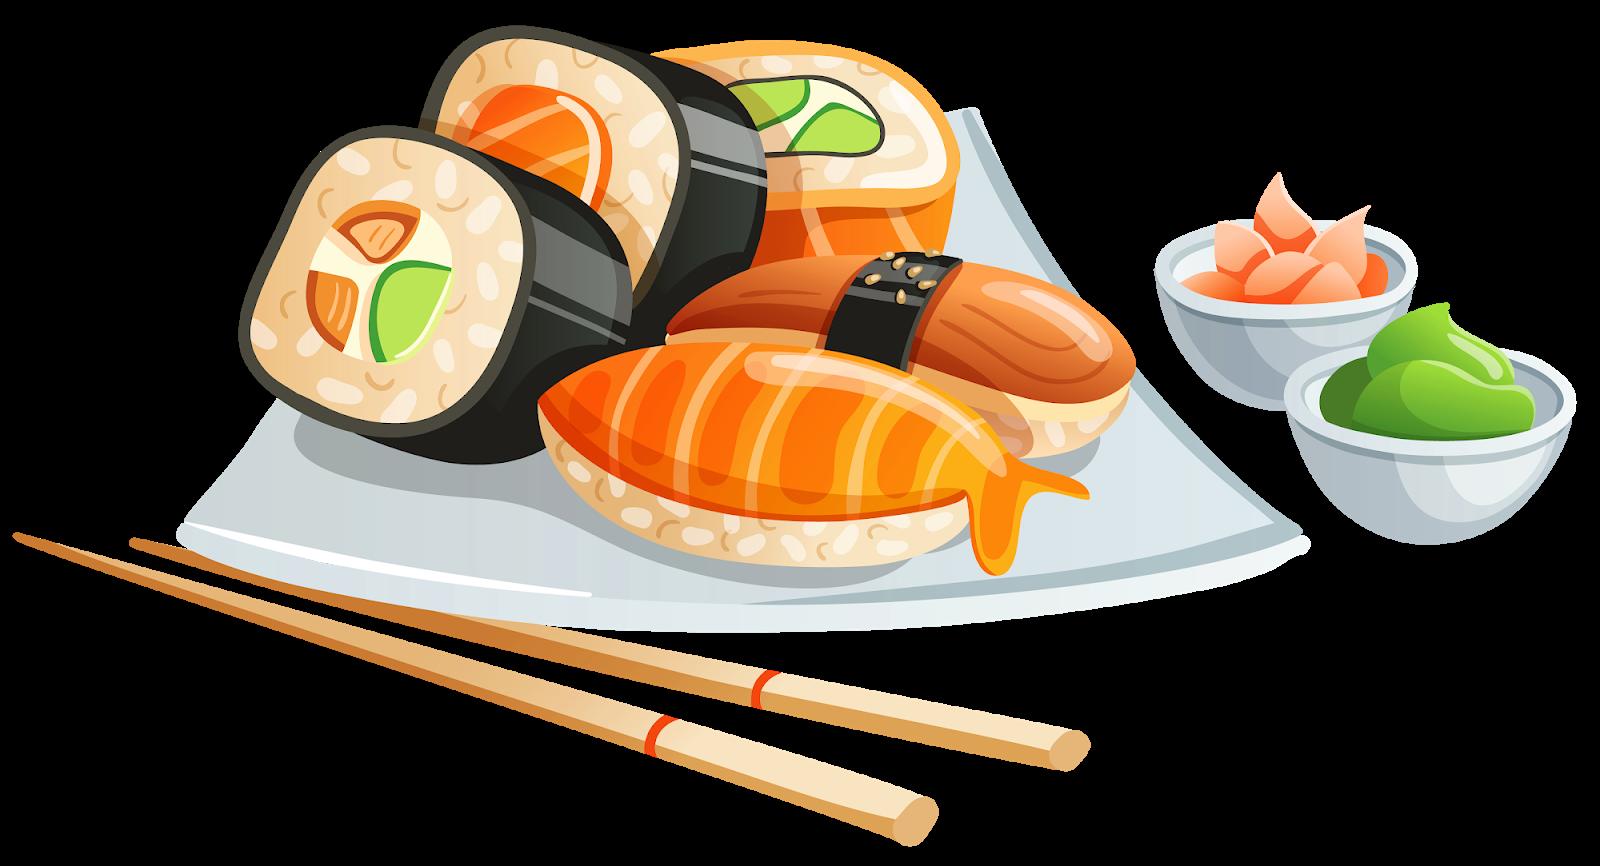 png royalty free Menu t philadelphia roll. Sushi clipart sushi bar